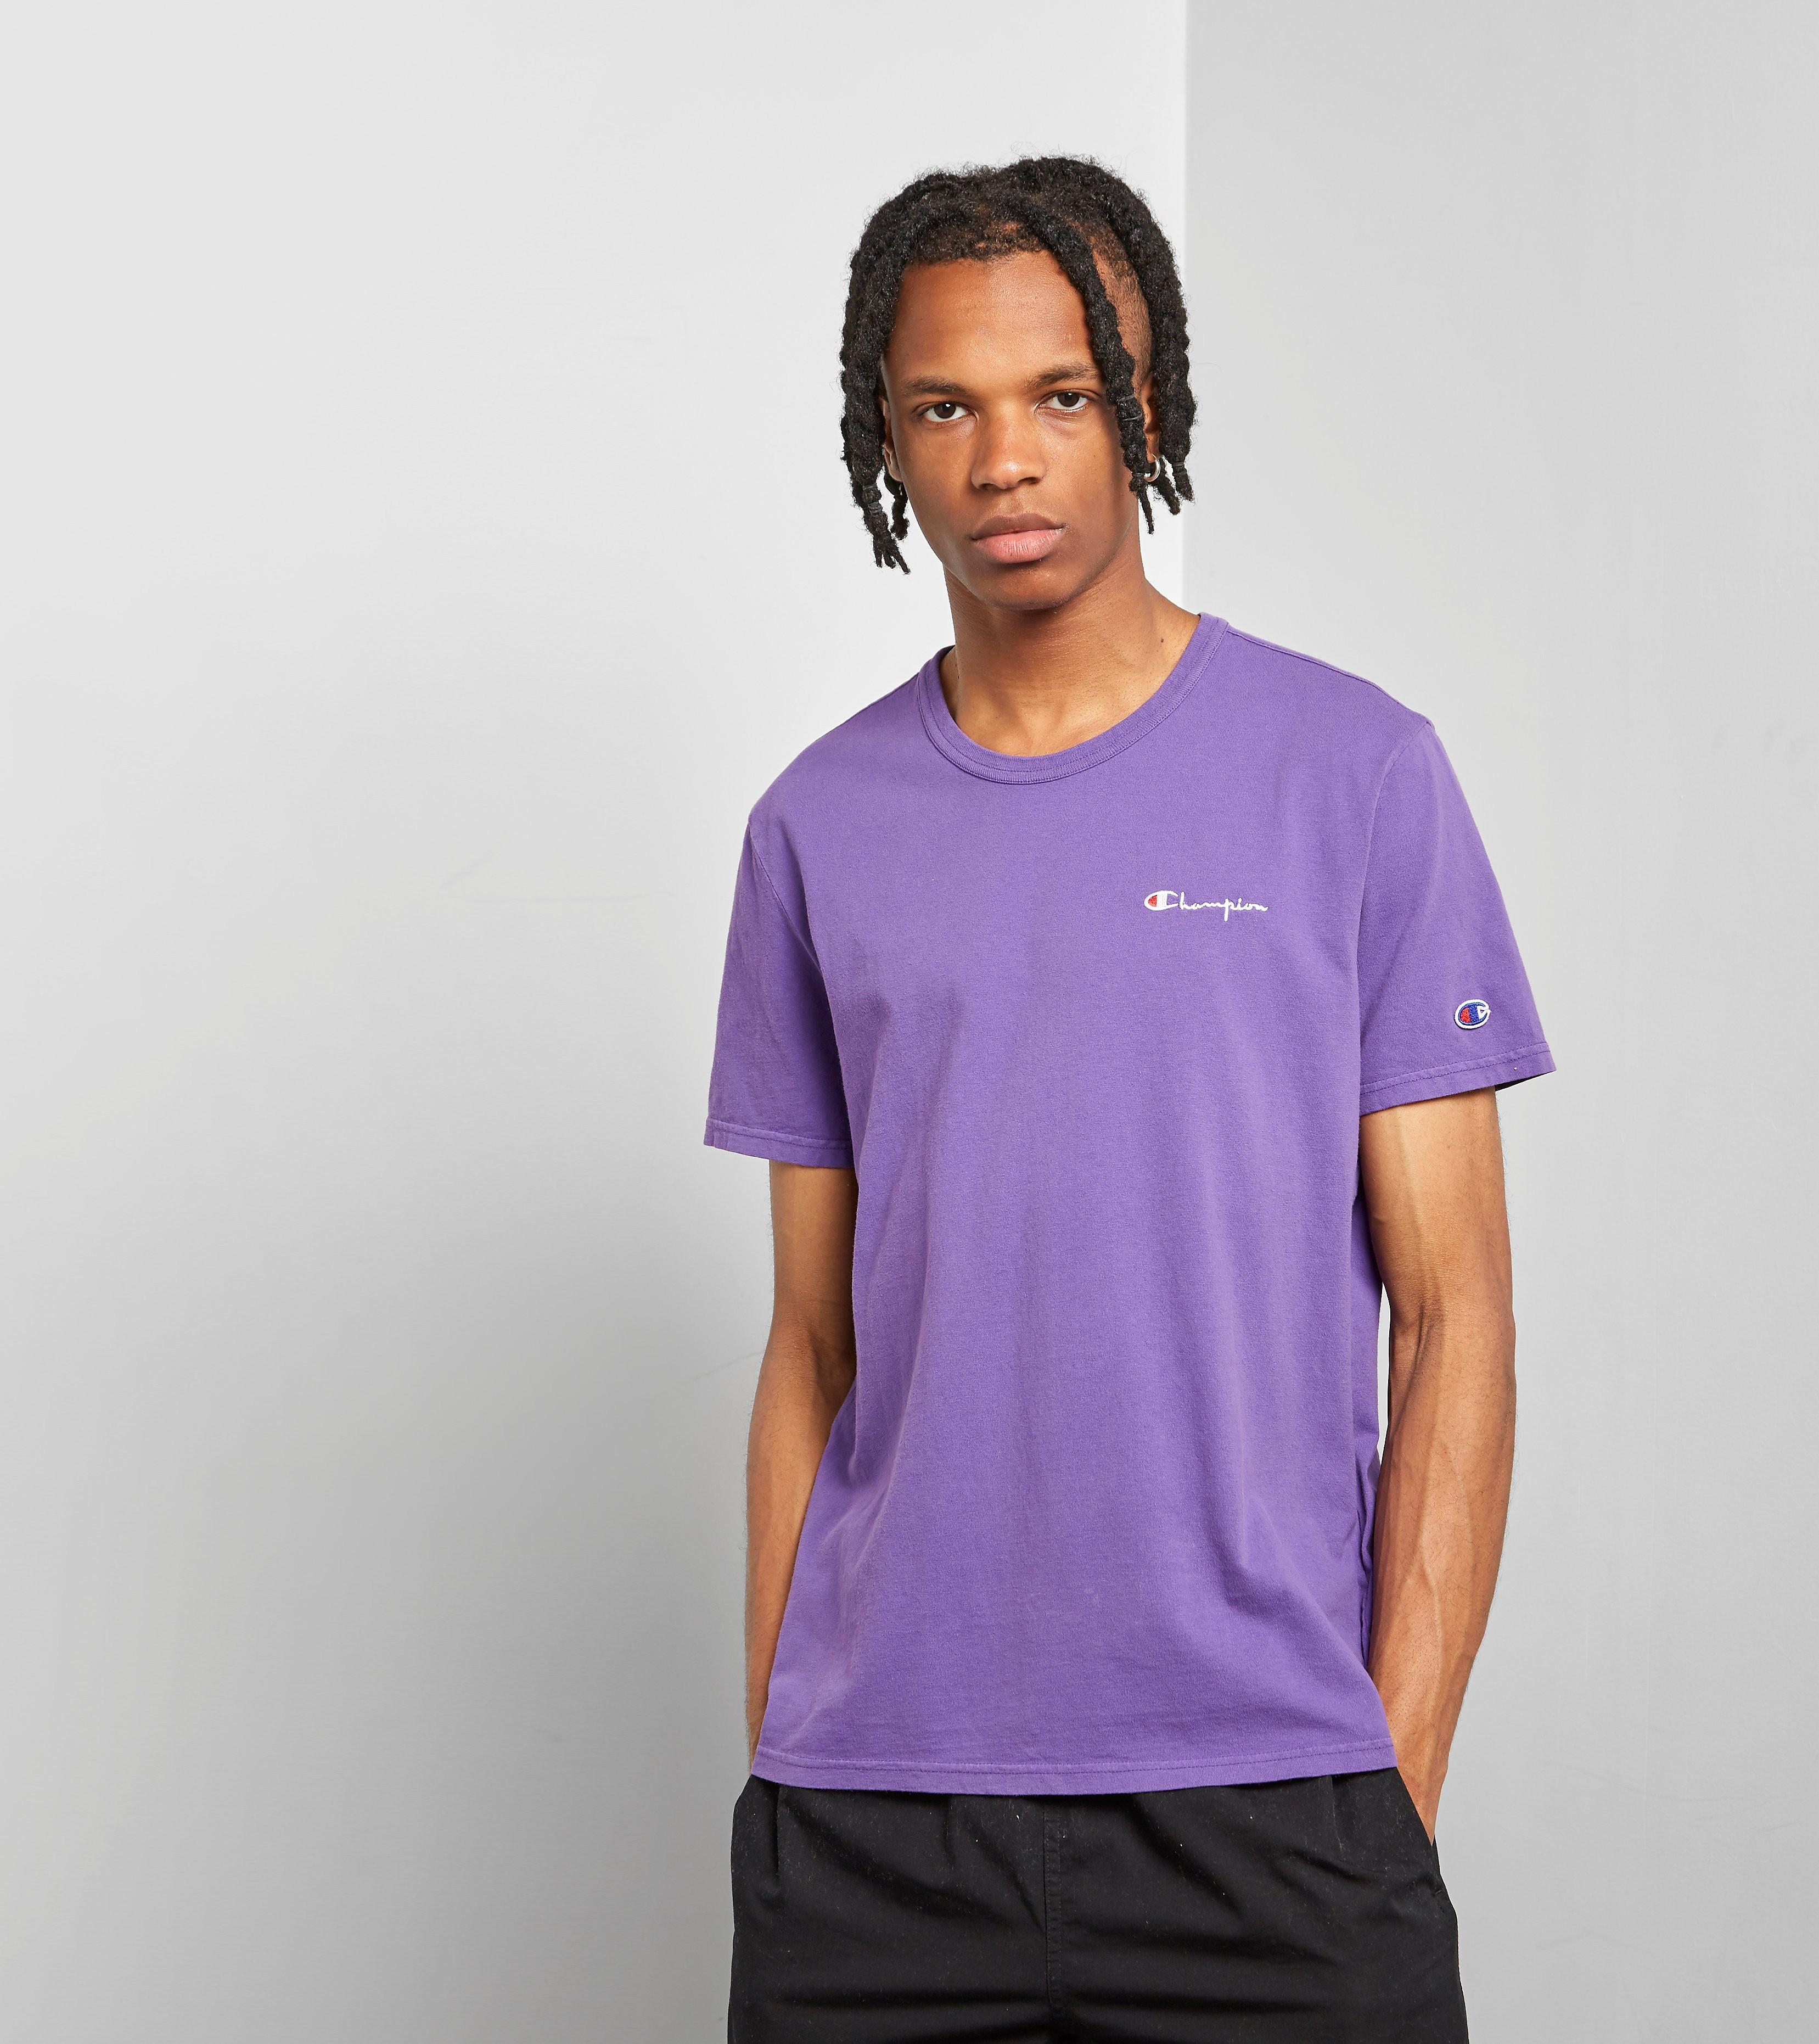 Champion GD T-Shirt - size? Exclusive